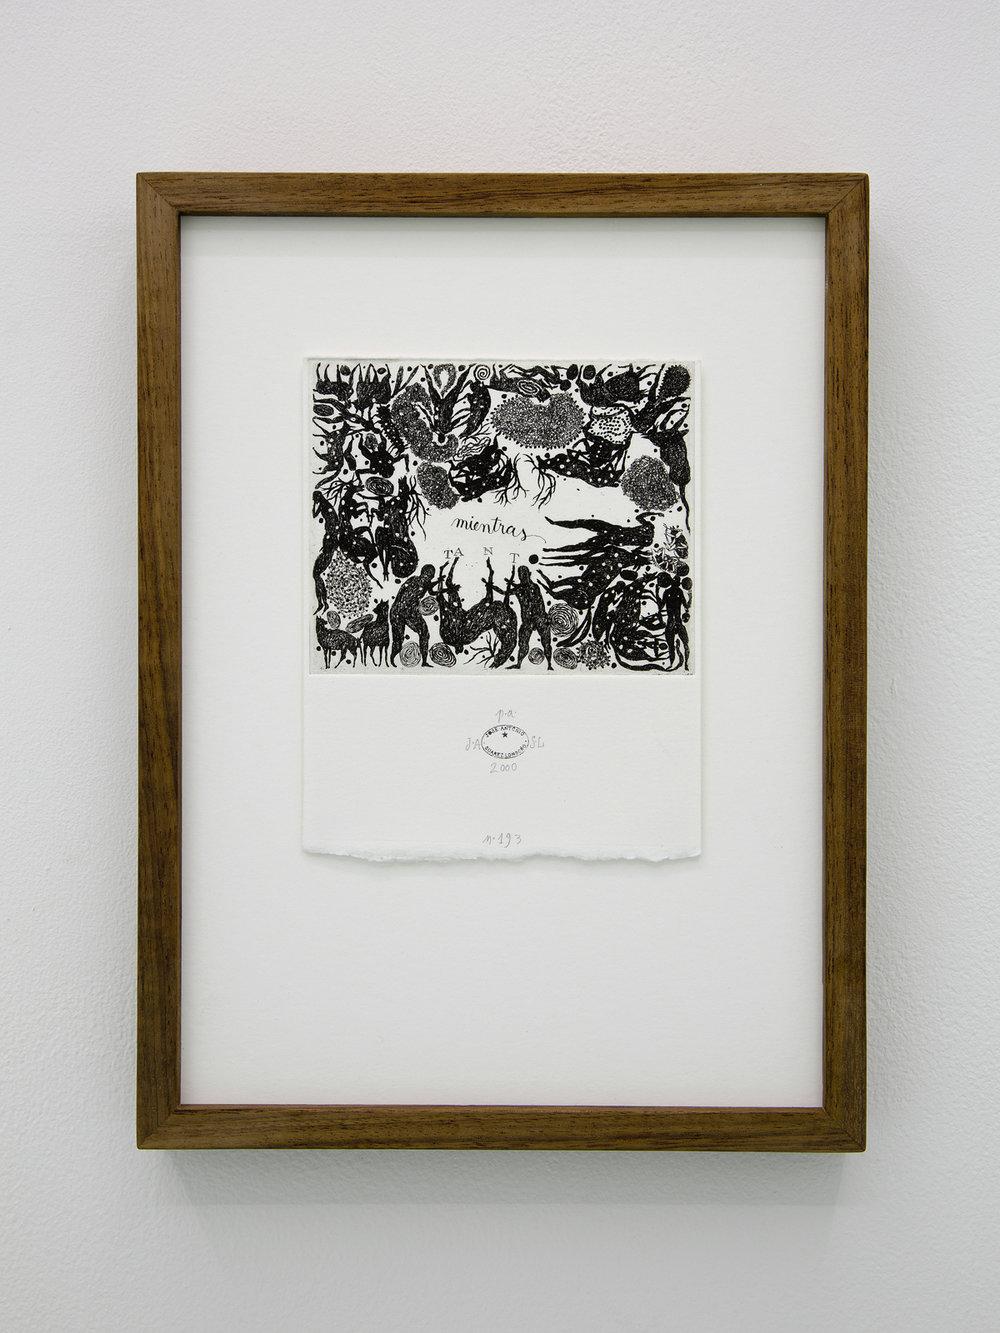 José Antonio Suárez Londoño, Untitled #193, 2000.